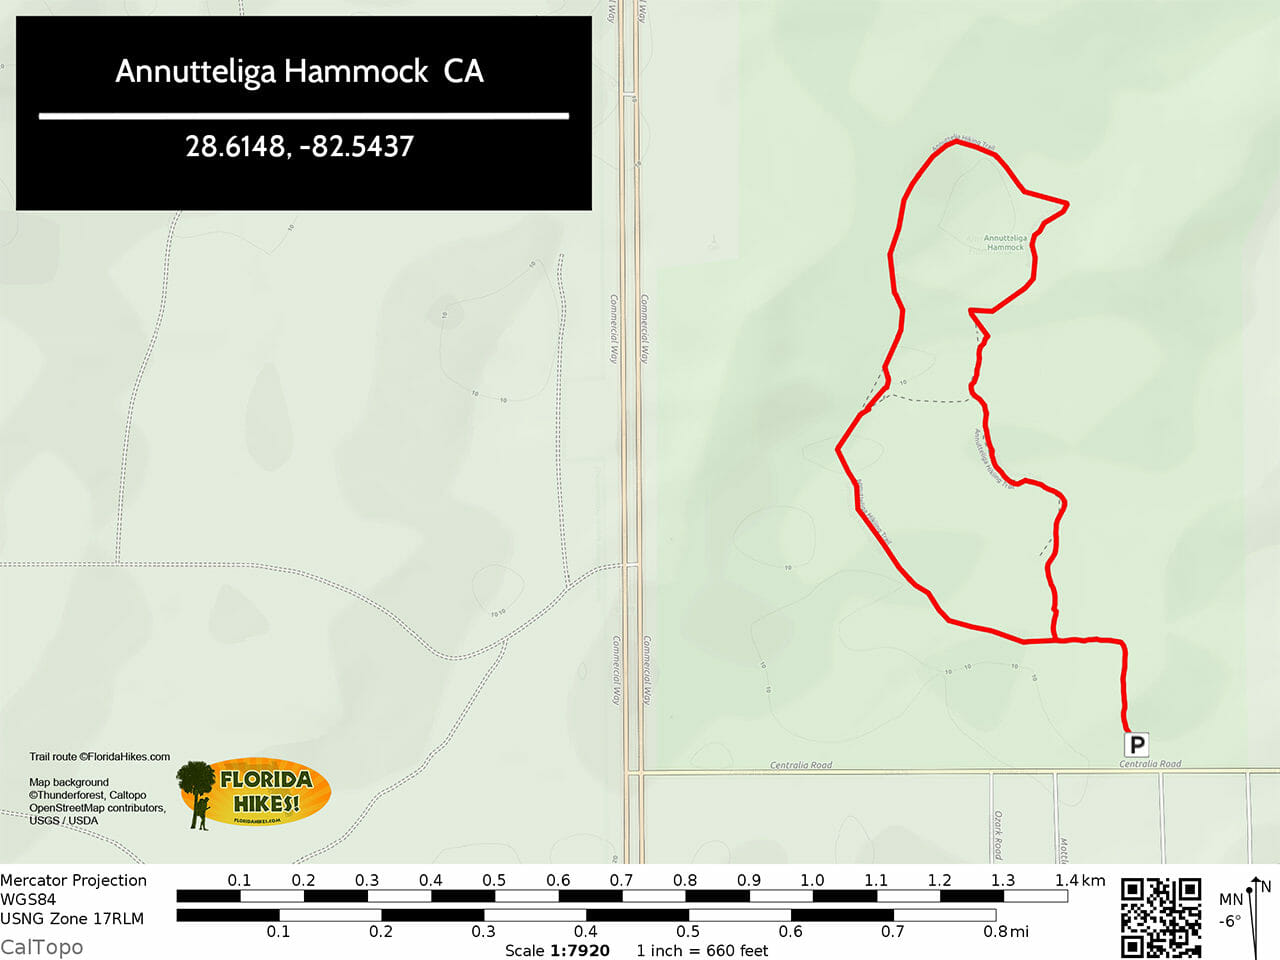 Annutteliga Hammock Trail Map